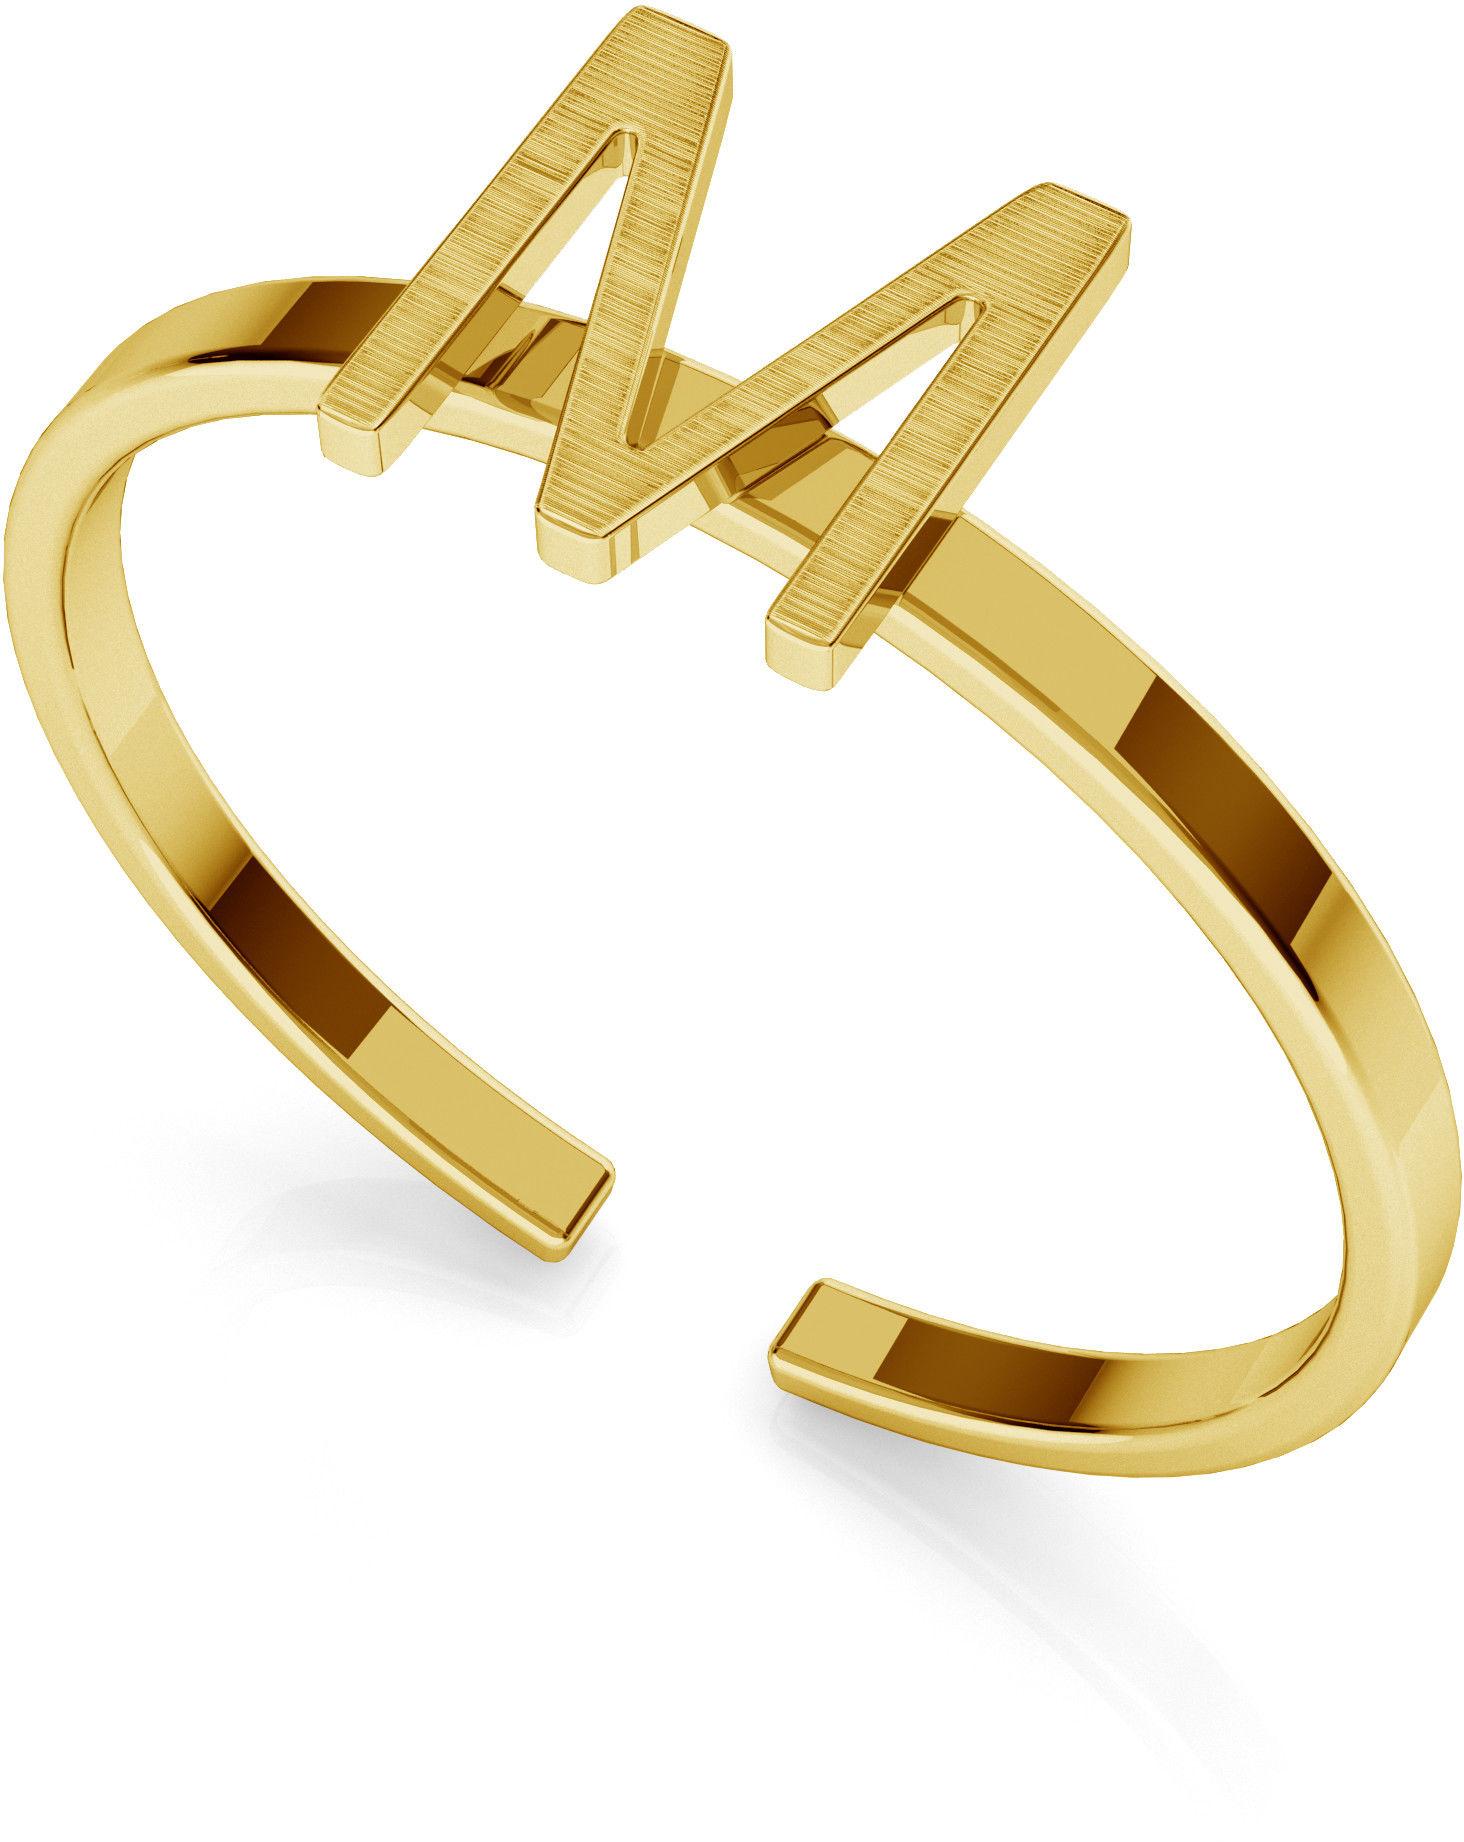 Srebrny pierścionek z literką My RING, srebro 925 : Litera - M, Srebro - kolor pokrycia - Pokrycie żółtym 18K złotem